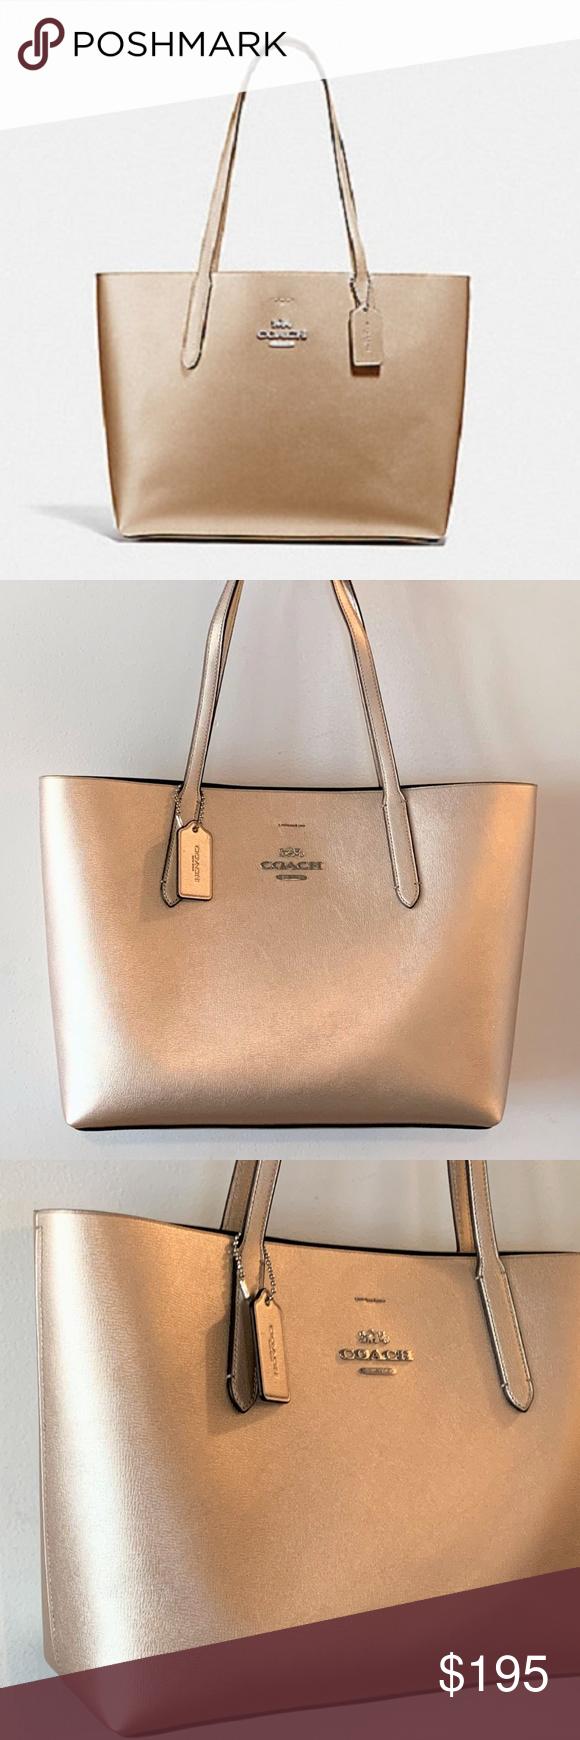 009e1b42f8d COACH Avenue TOTE Bag ~ Metallic Platinum Leather Coach F37871 Avenue Tote Brand  New with Tags